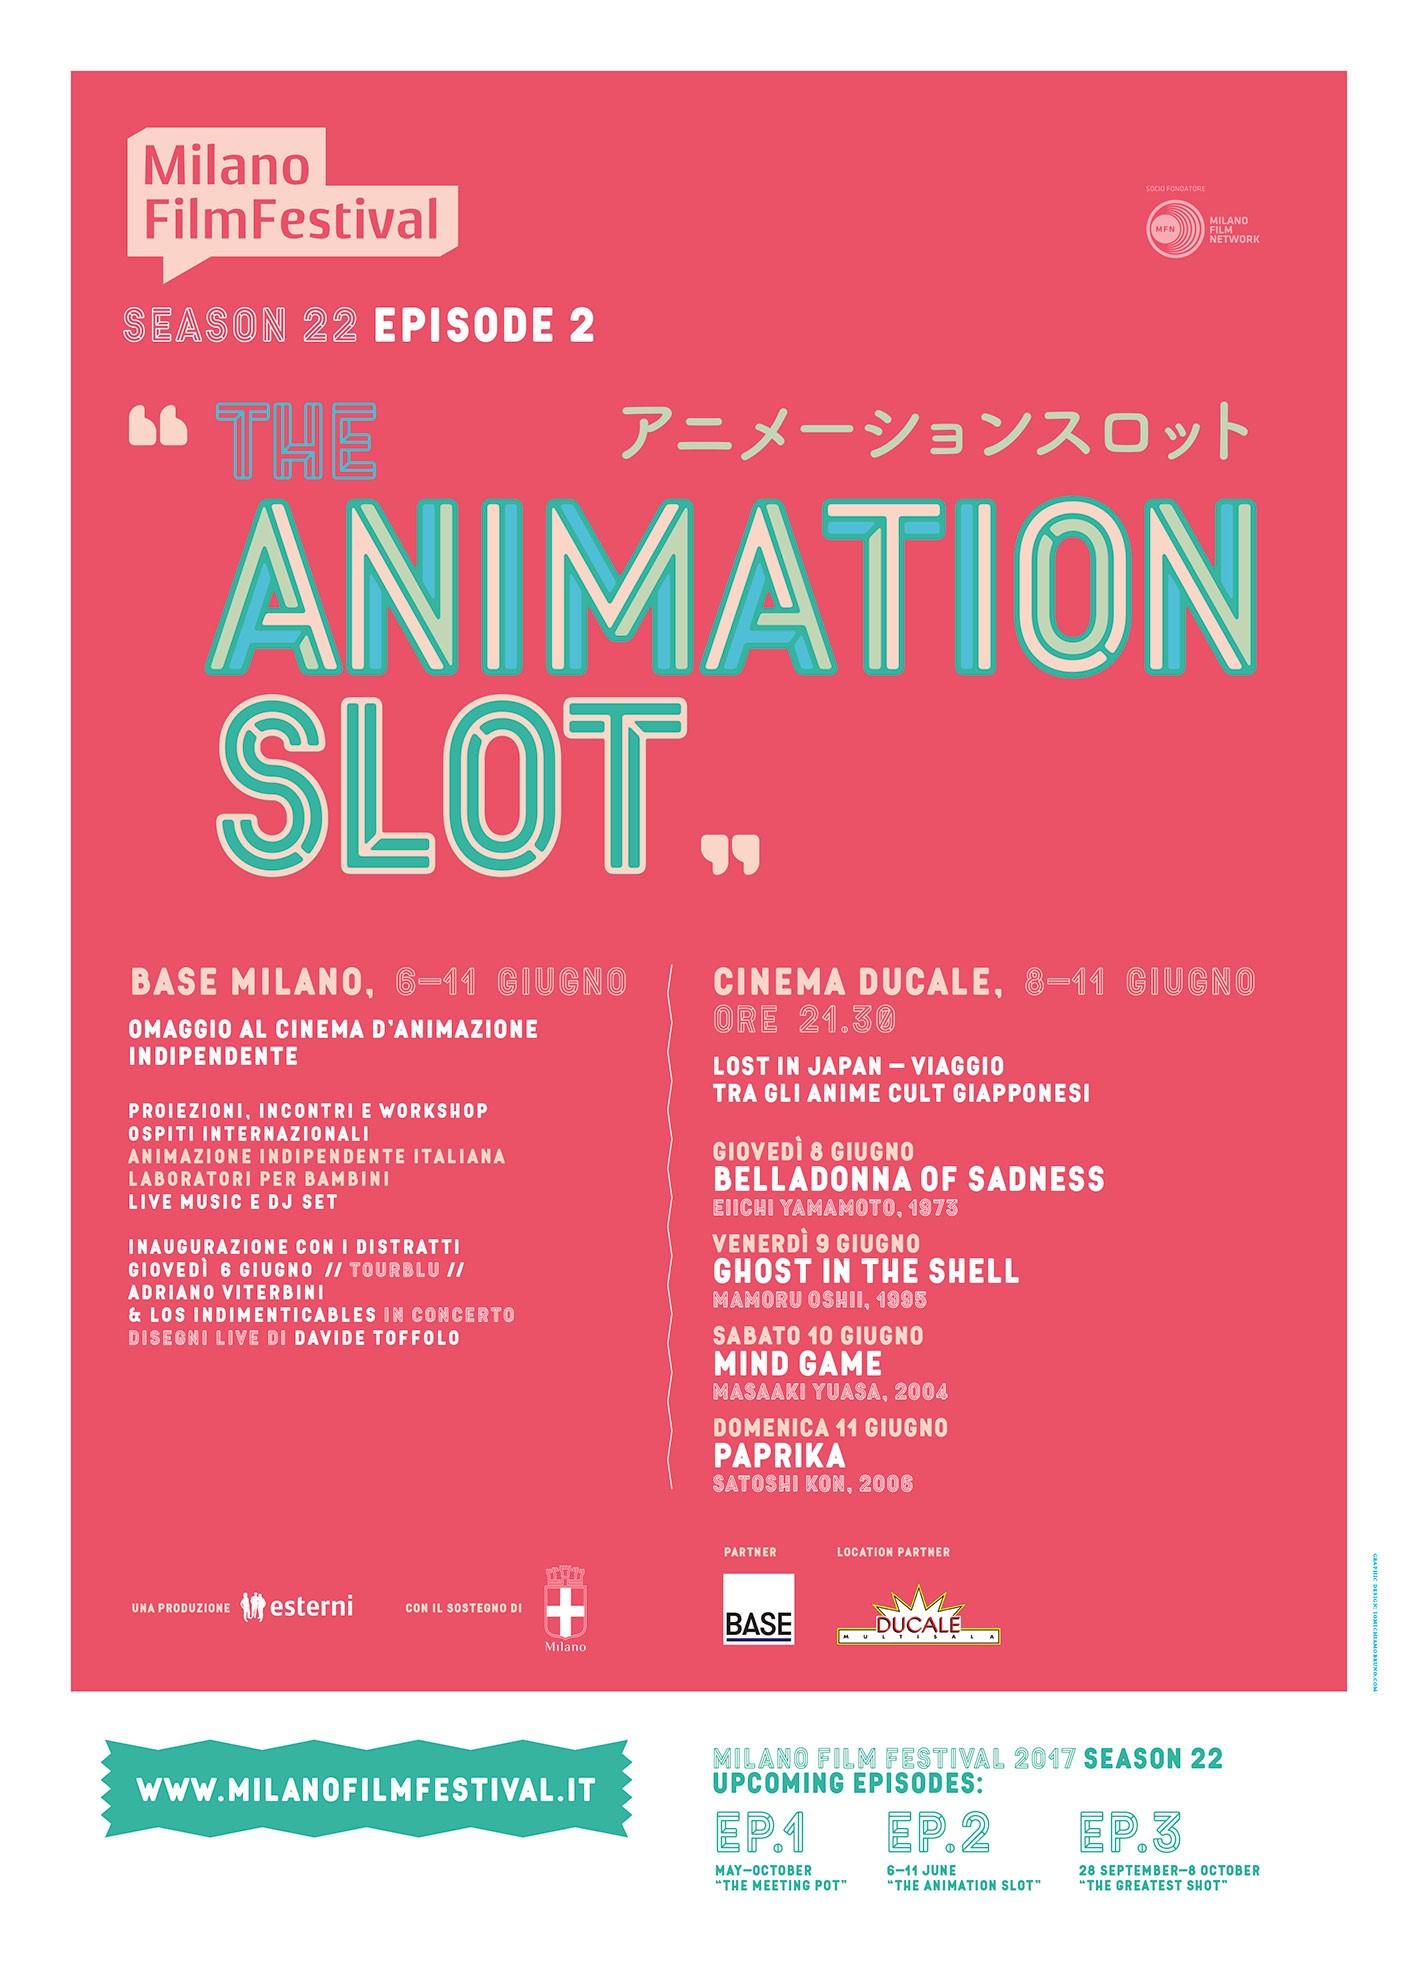 The Animation Slot